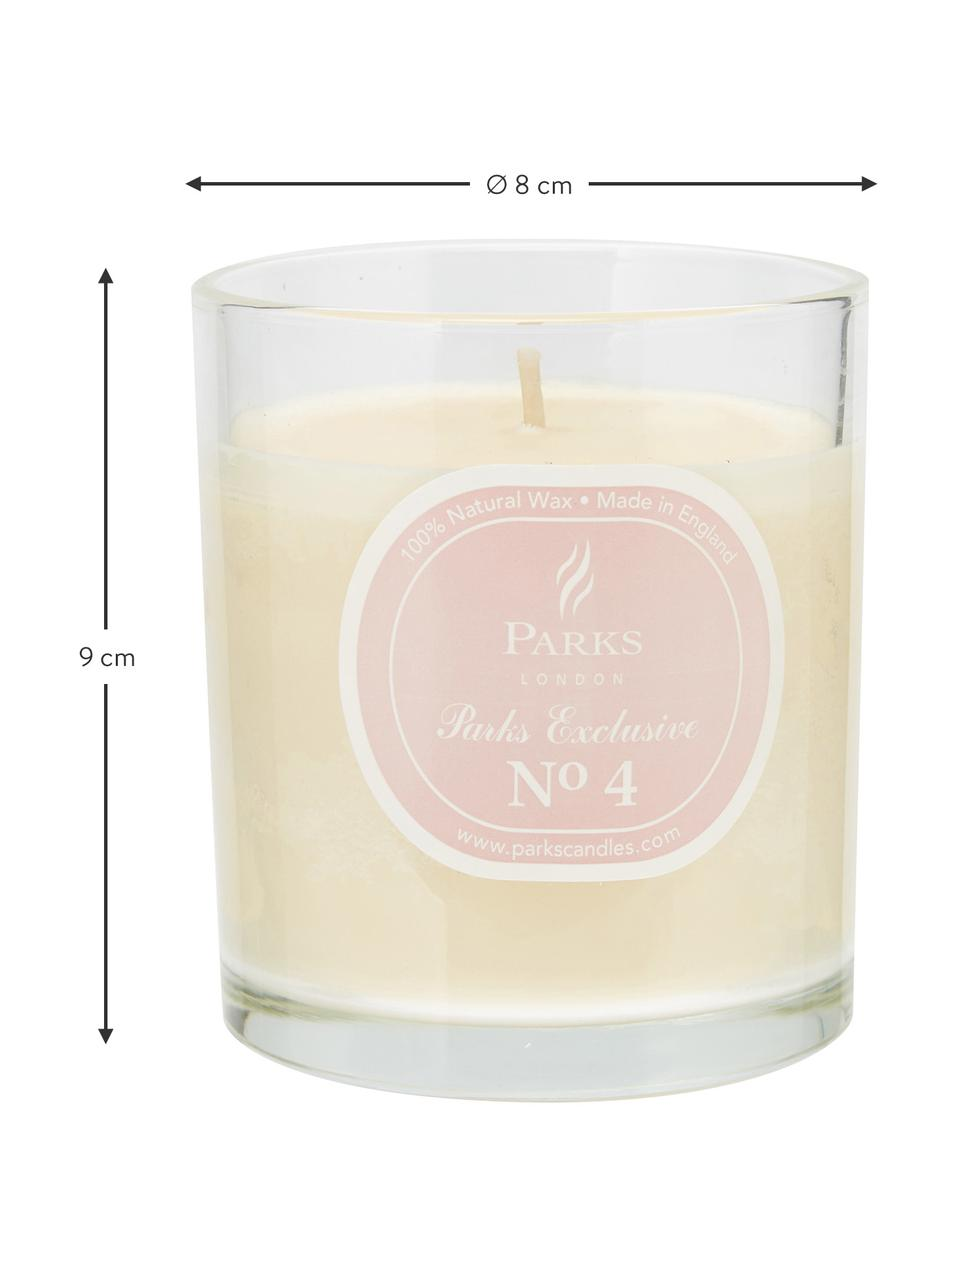 Duftkerze Exclusive No 4 (Passionsblume & Vanille), Behälter: Milchglas, Passionsblume & Vanille, Ø 8 x H 9 cm